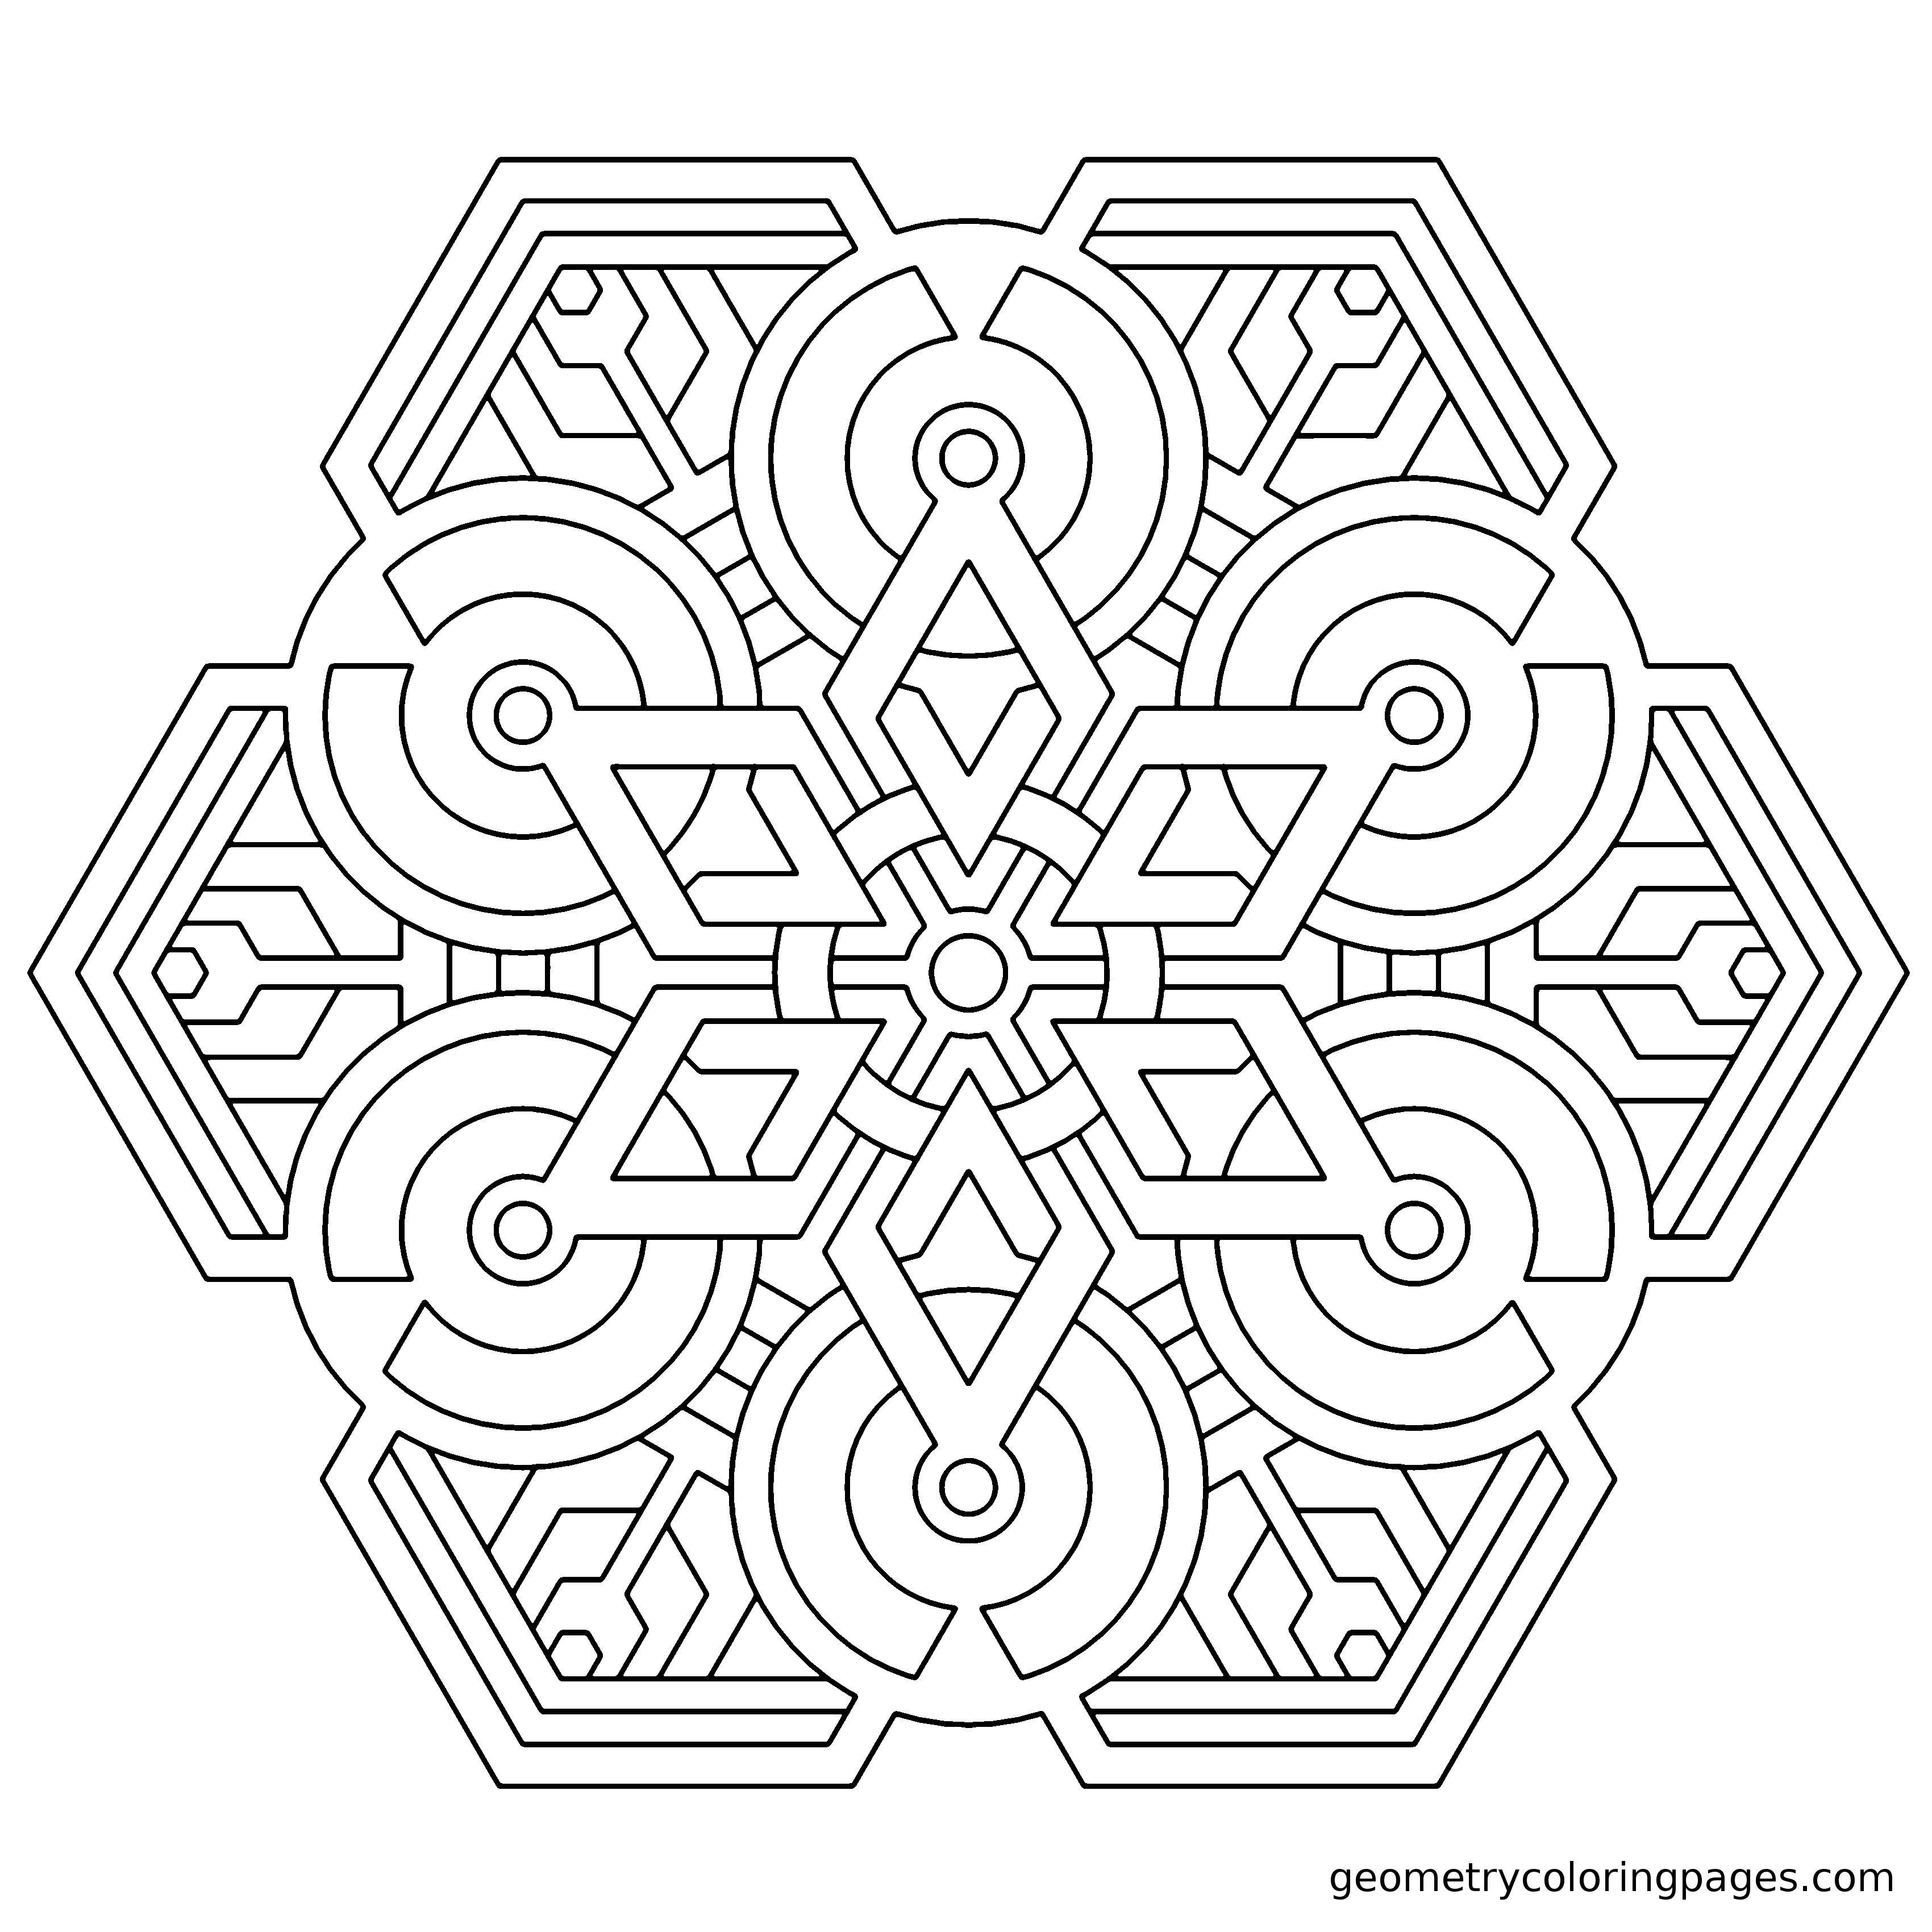 Metatron S Generator Ii Geometrycoloringpages Com Geometric